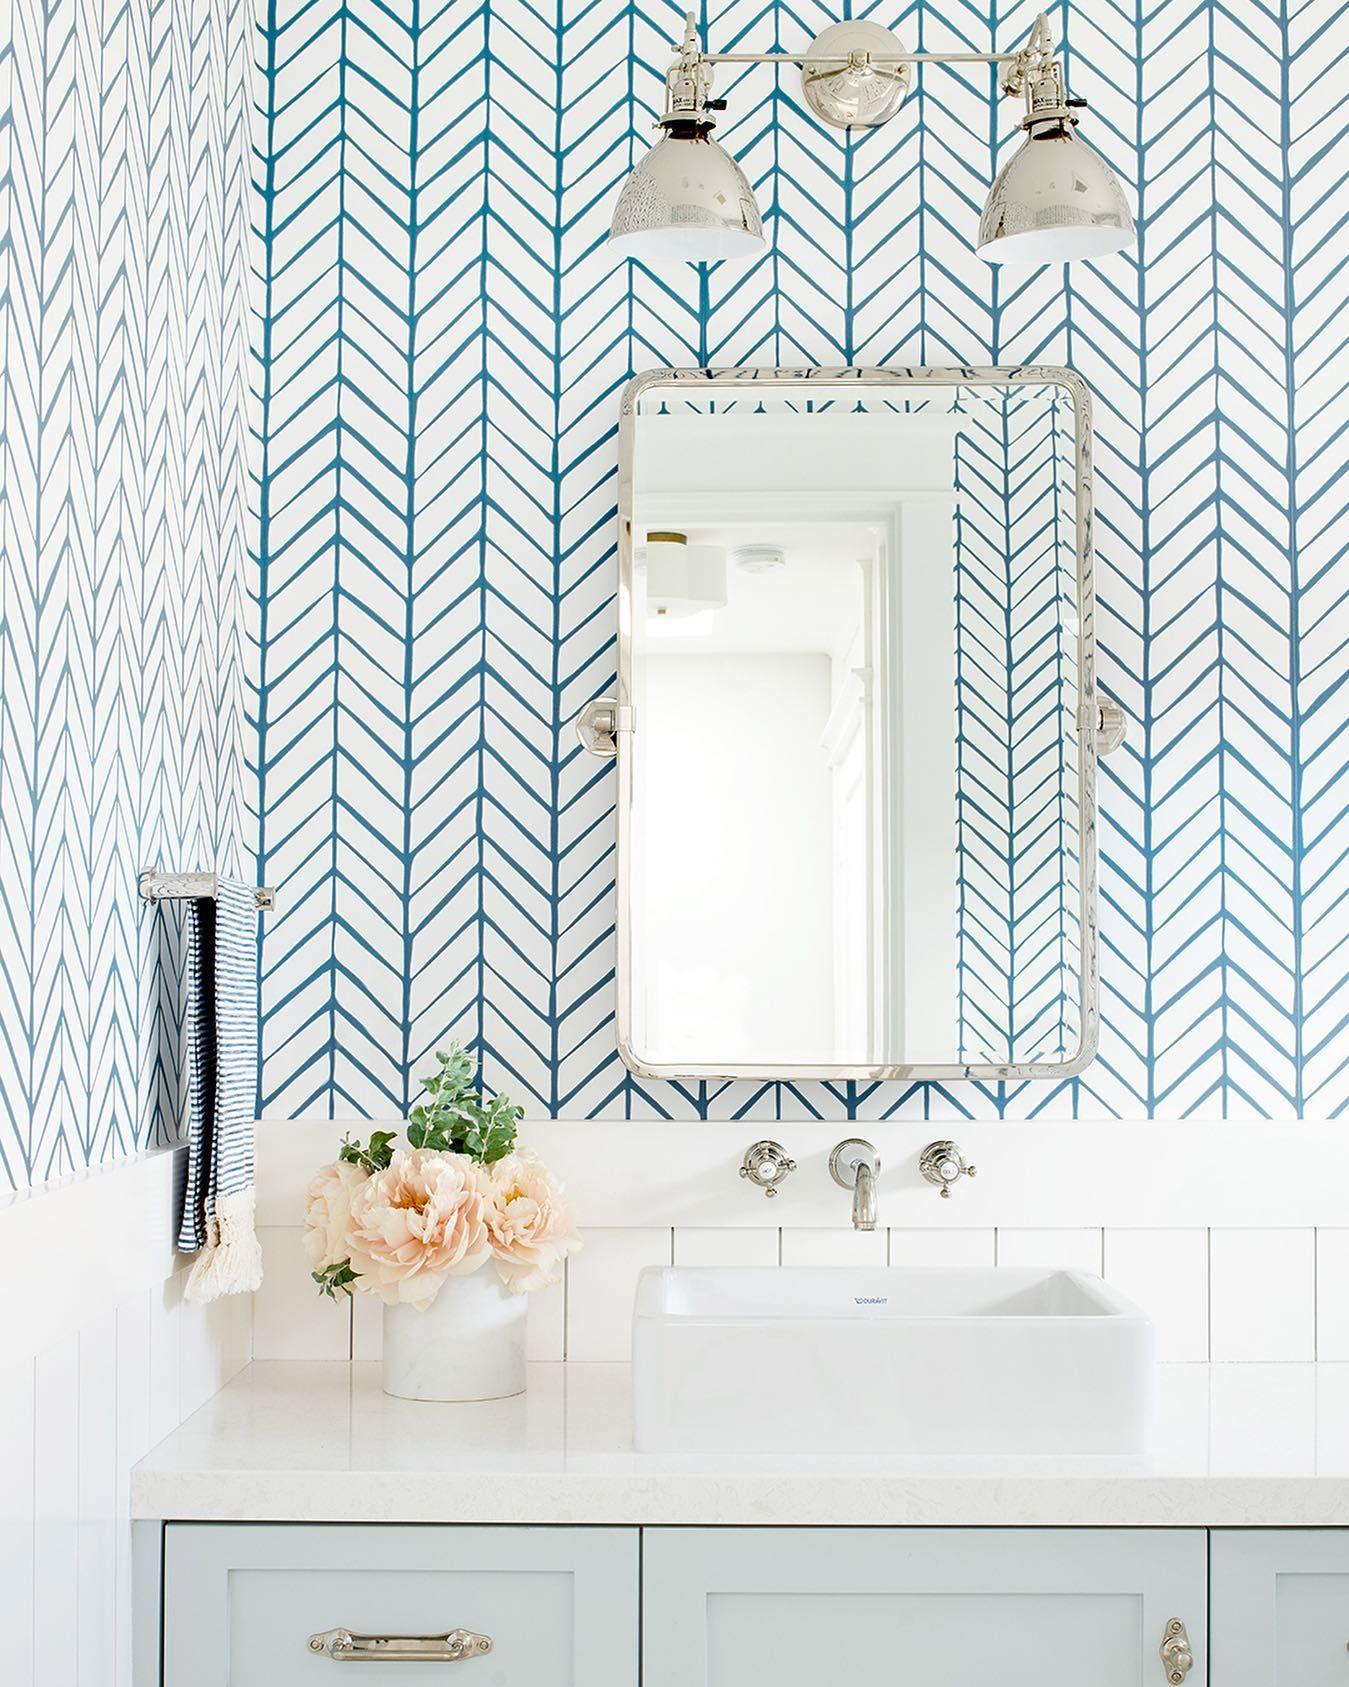 Feather Wallpaper Bathroom Wallpaper Trends Small Bathroom Decor Feather Wallpaper